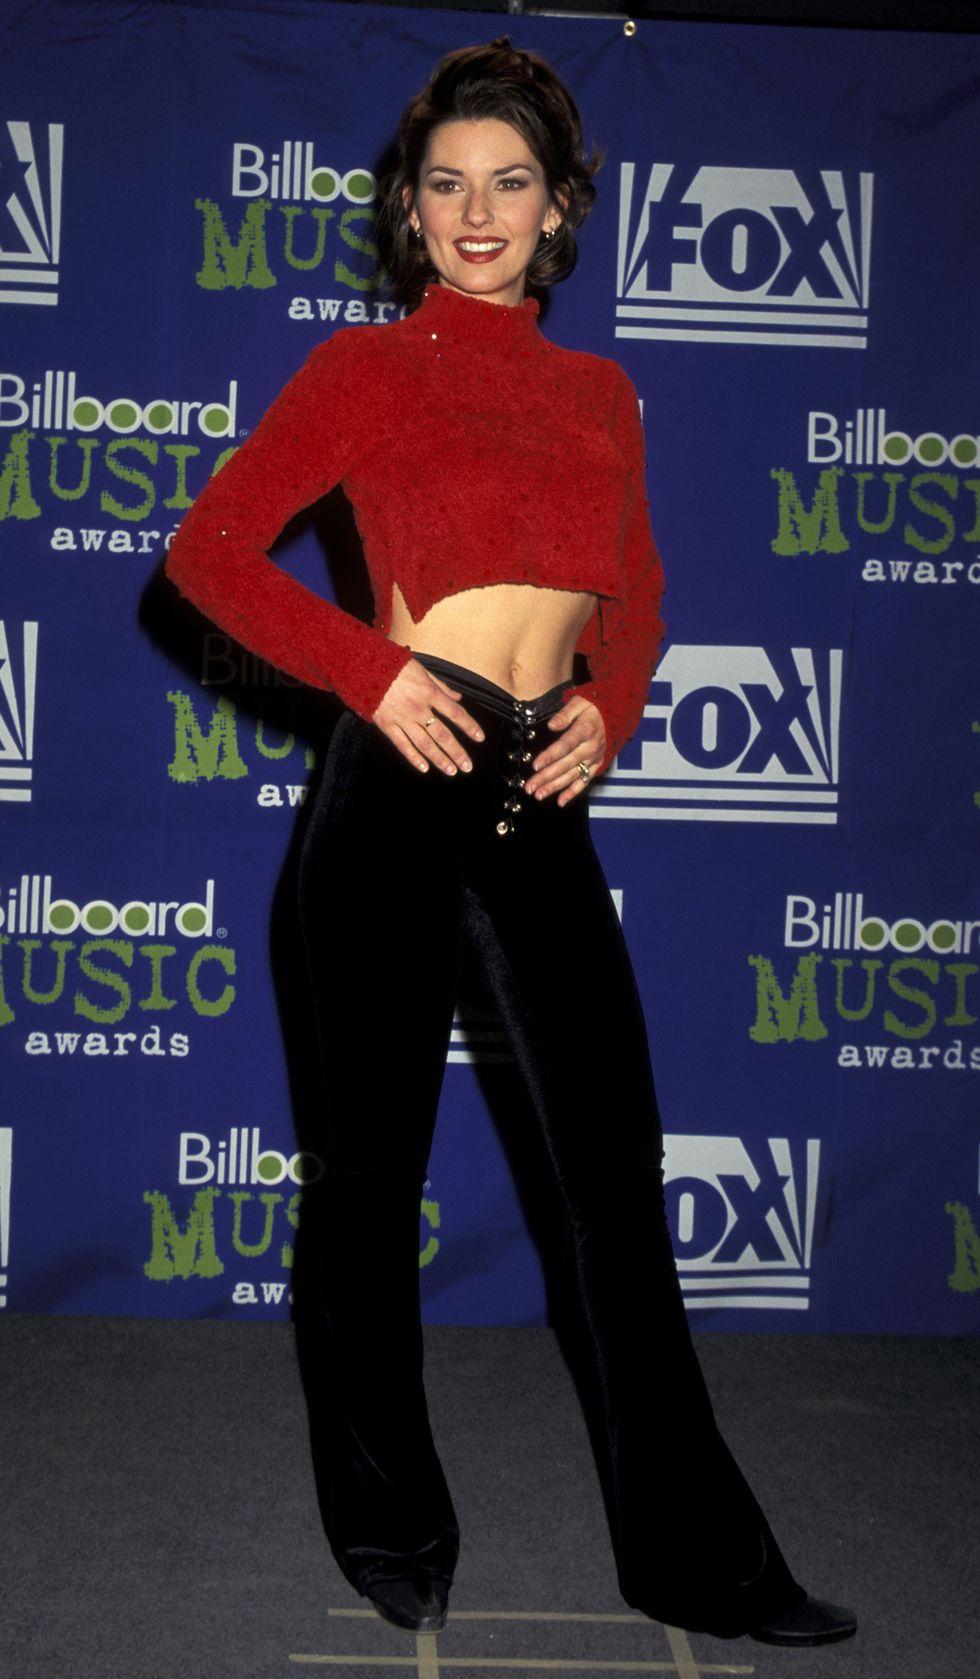 Shania Twain (Photo by Ron Galella/WireImage)